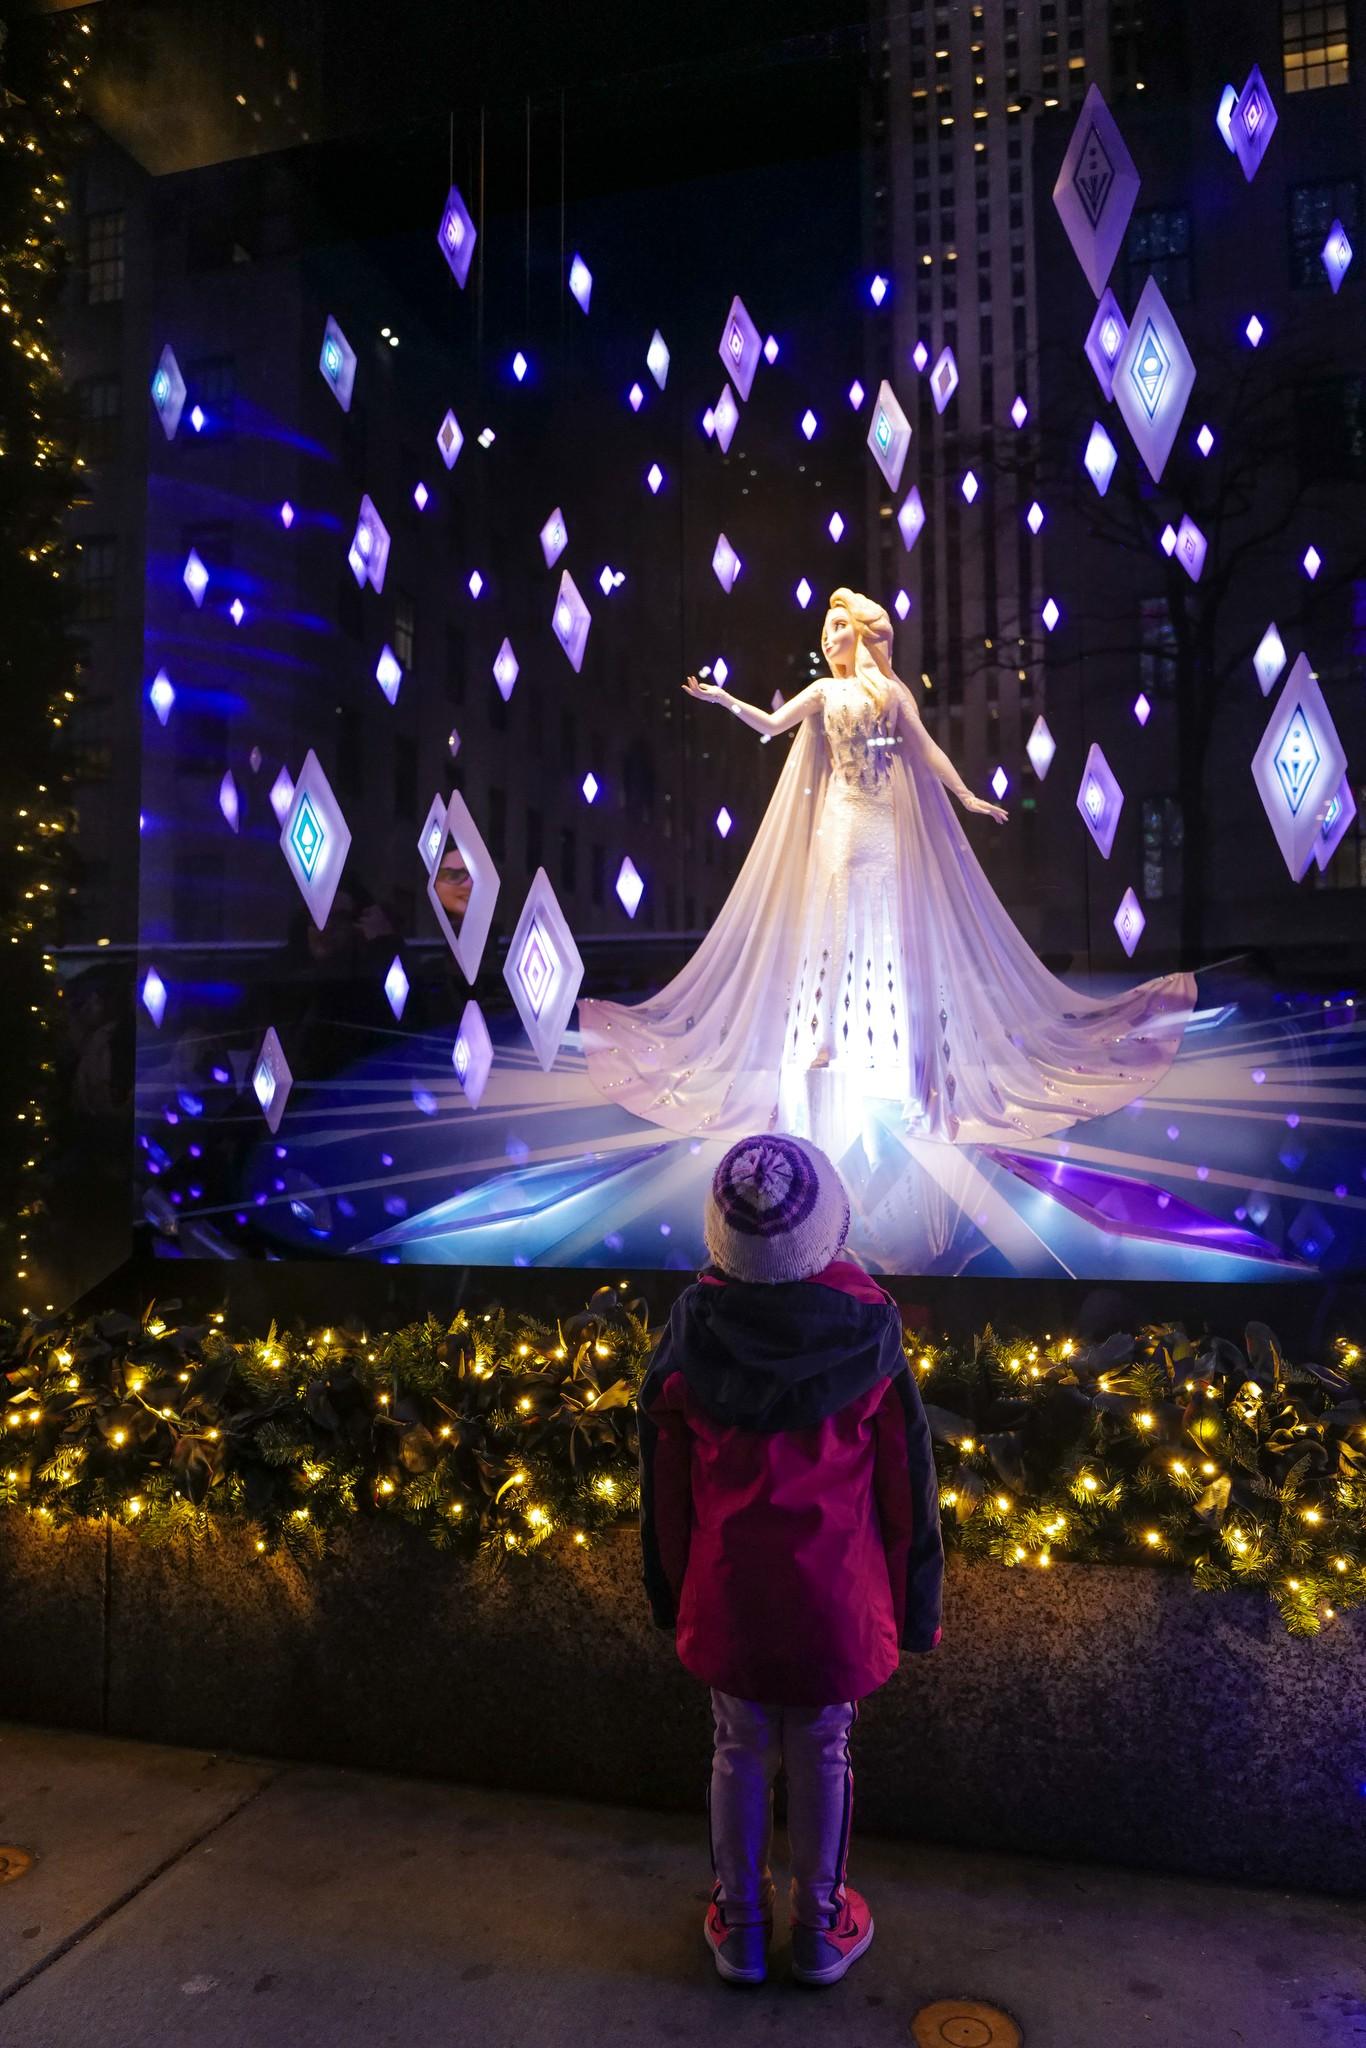 Fifth Avenue Christmas Windows 2020 Saks Fifth Avenue Debuts 'Frozen 2' Themed Holiday Windows [PHOTOS